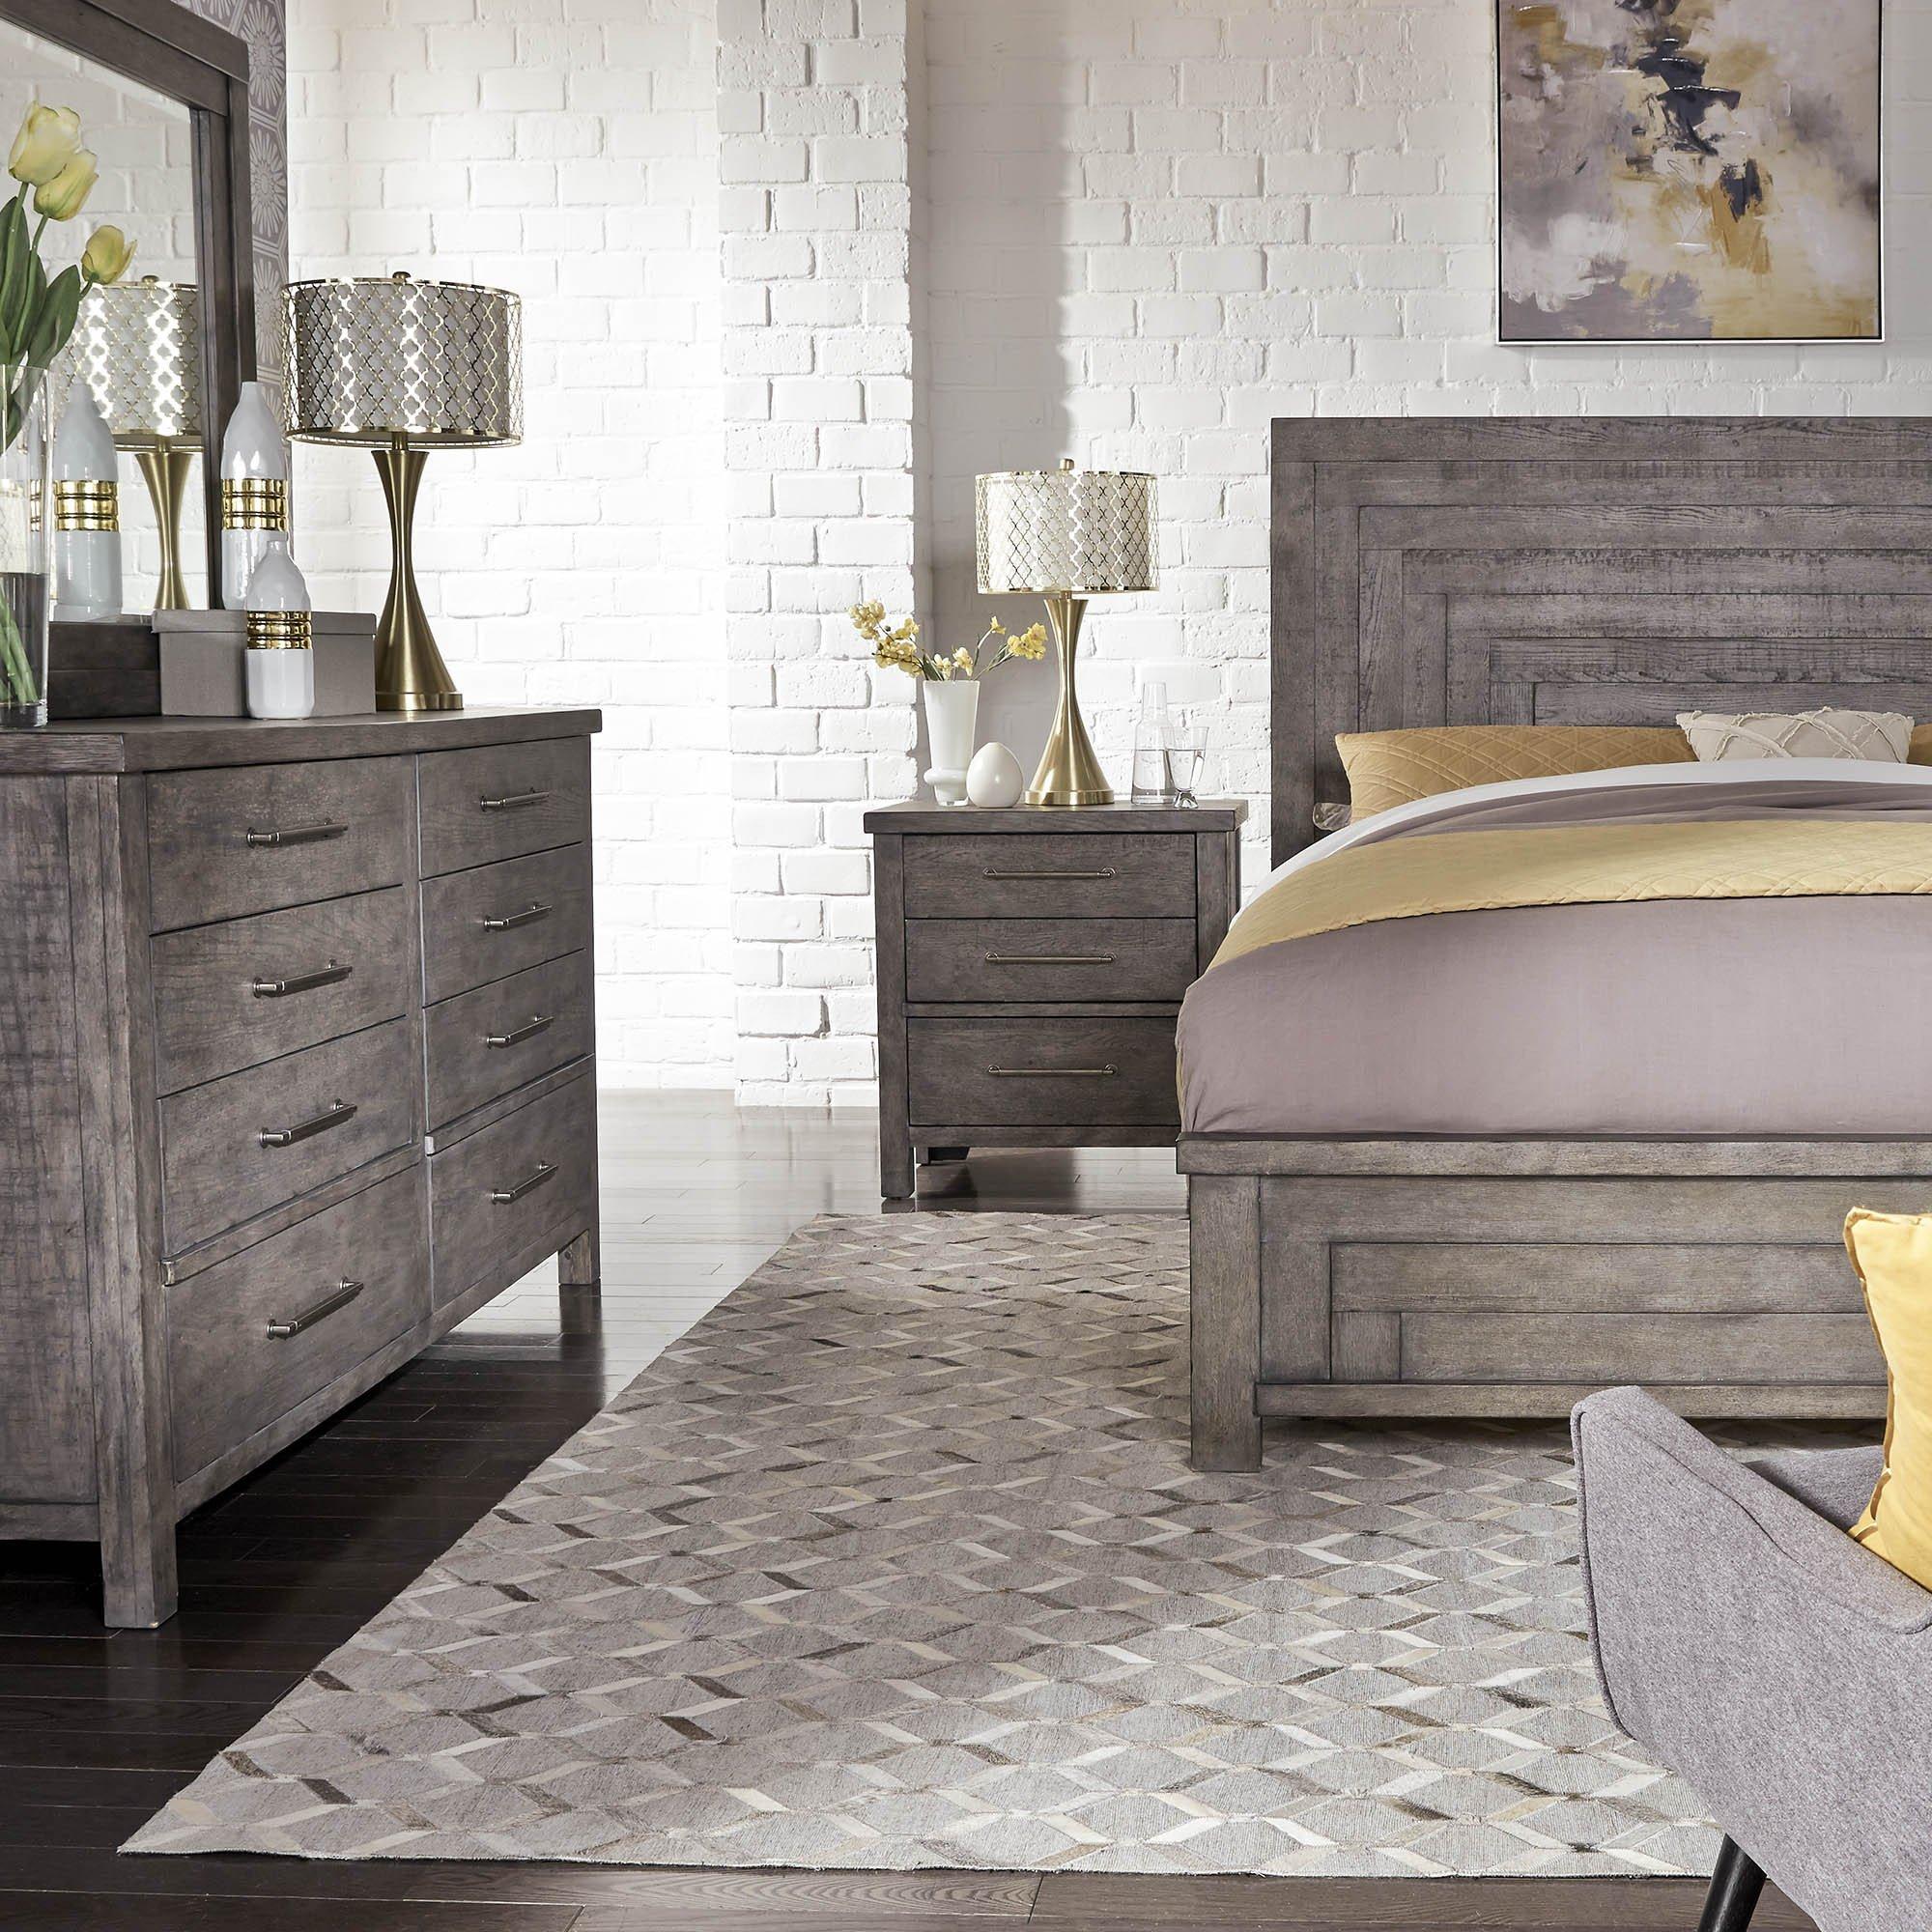 Ashley Furniture Bedroom Set 14 Piece Best Of Homepage Title